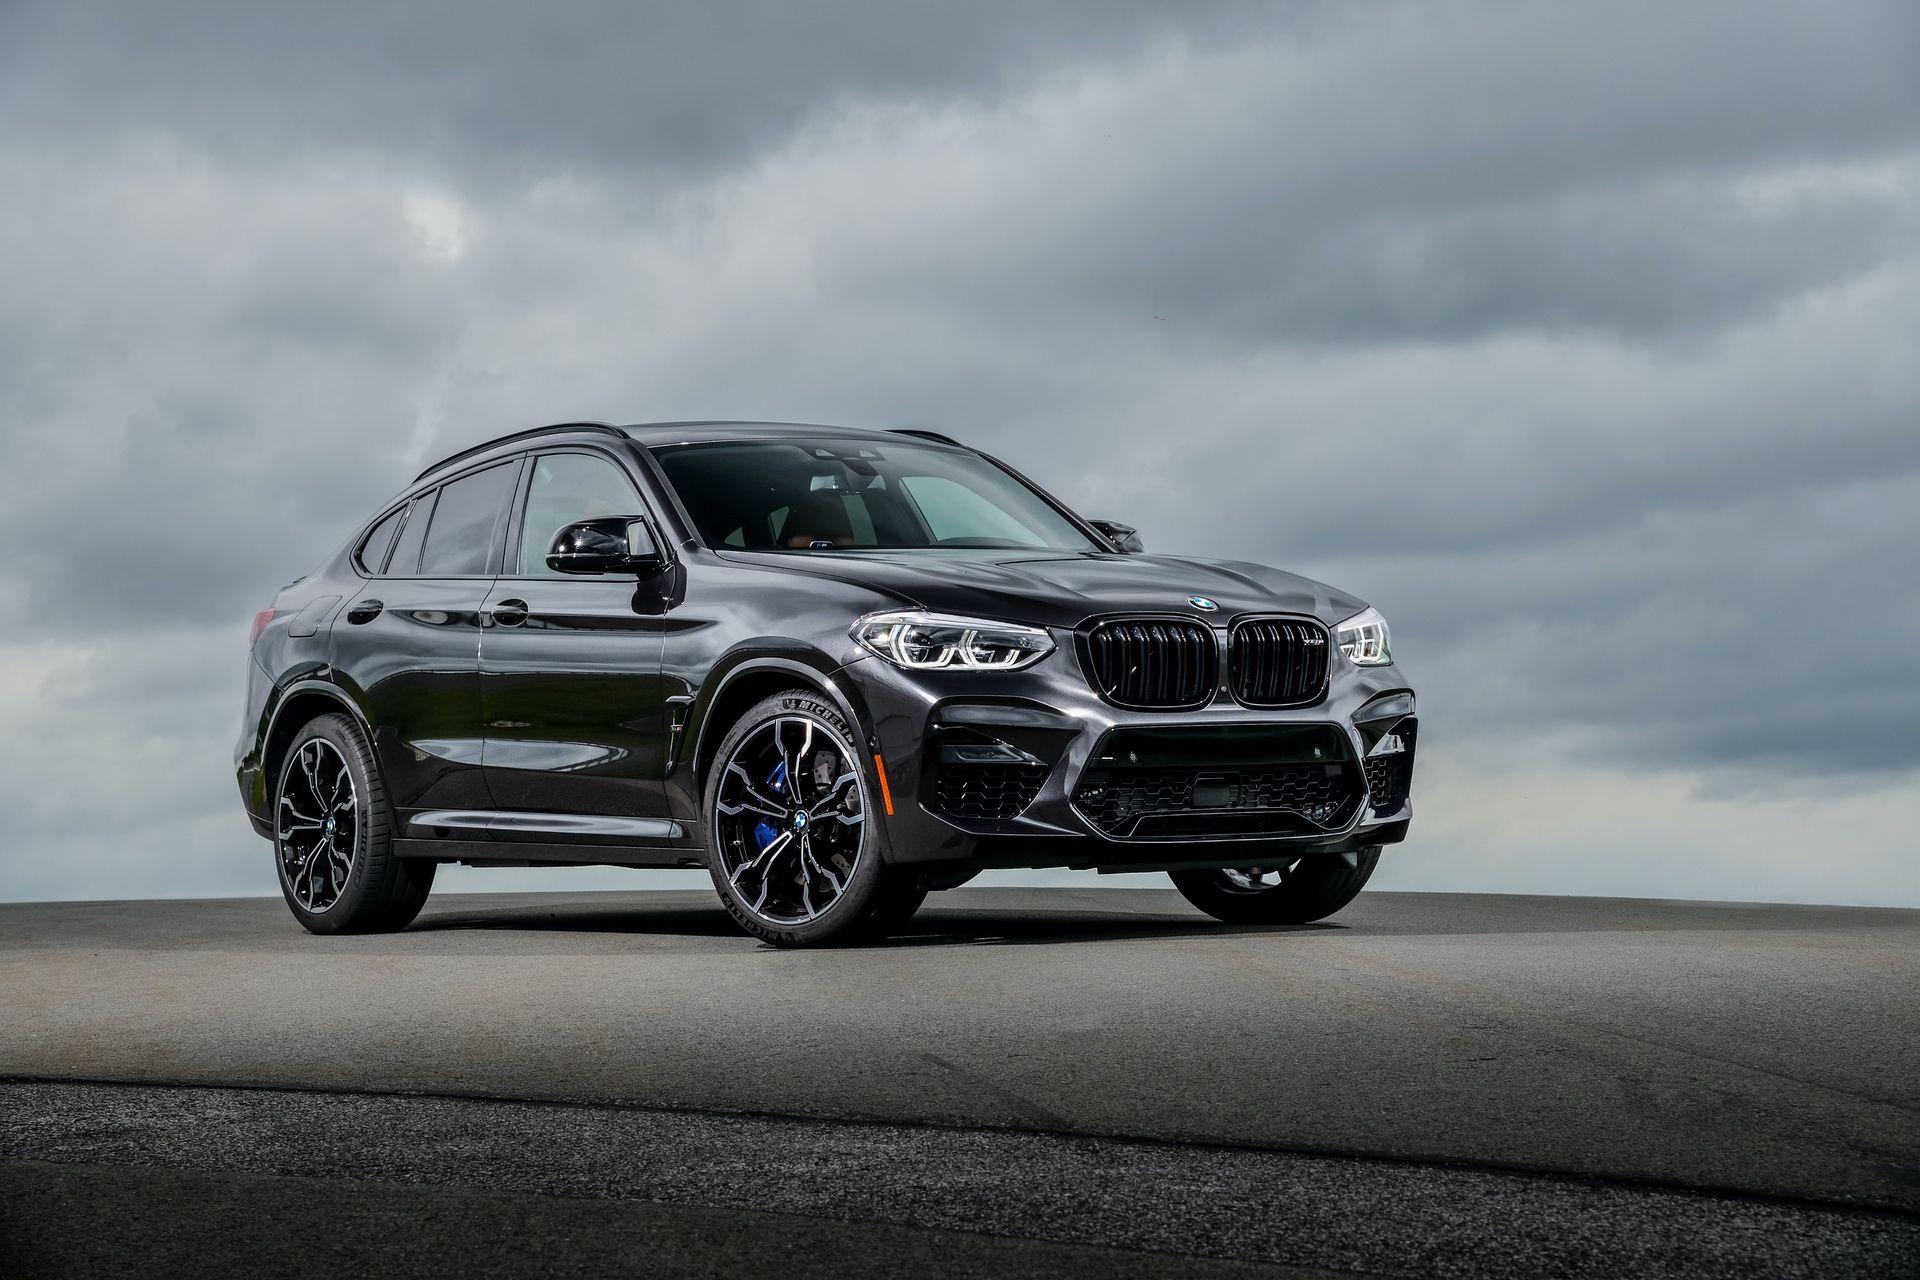 2020 Bmw X4 M Looks Imposing In Sophisto Grey Color Bmw X4 Bmw